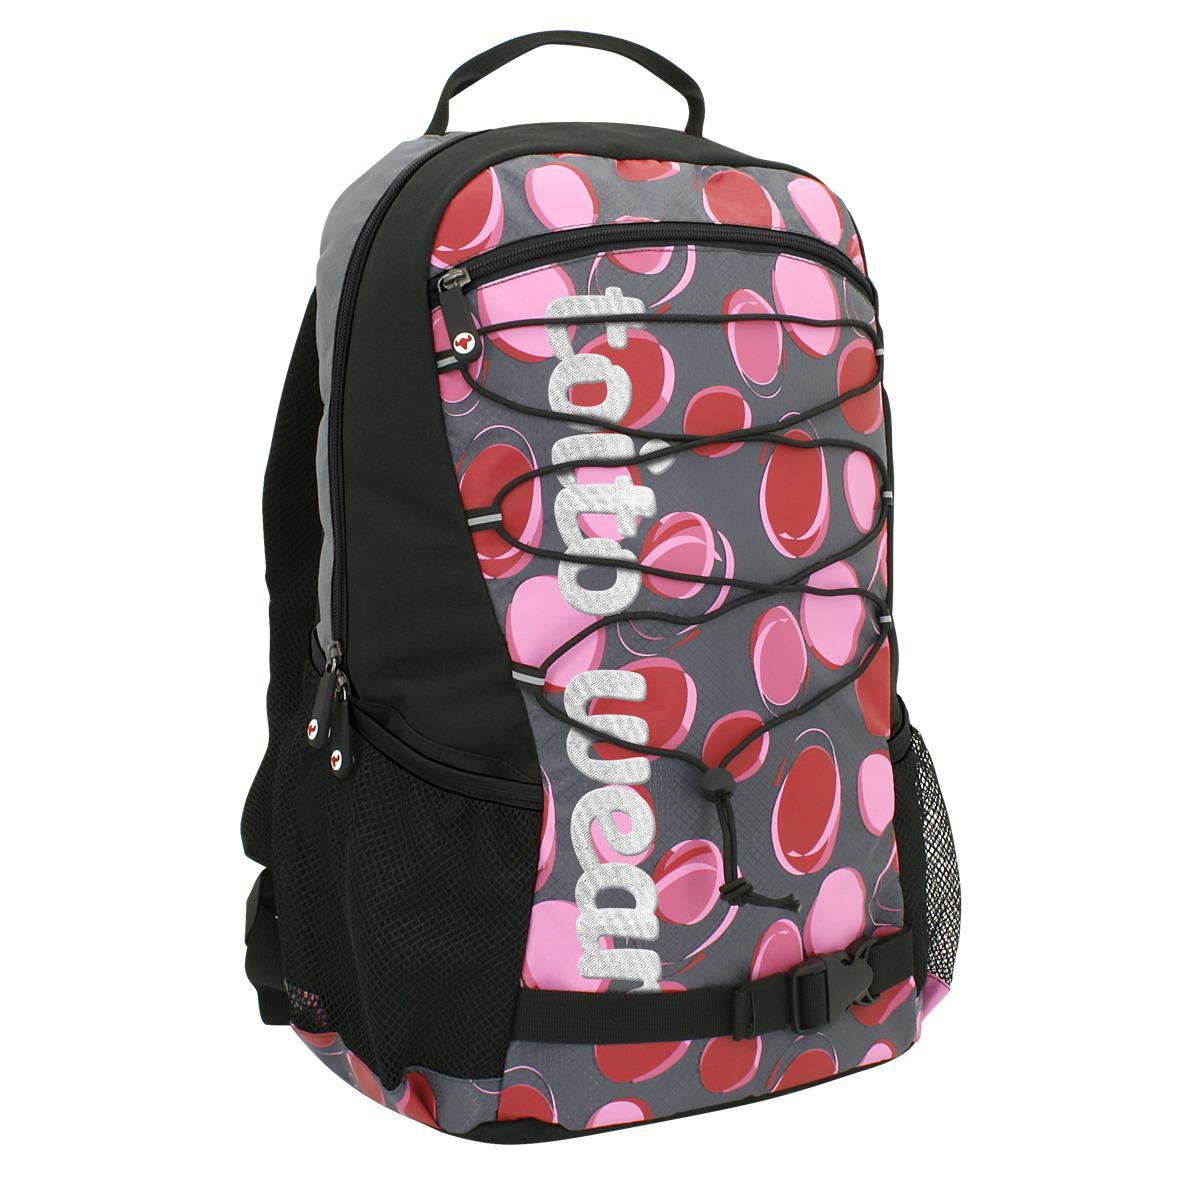 43a414280ddc2 Rucksack Dotty Schulrucksack Sportrucksack Freizeitrucksack  Multifunktionsrucksack Schulranzen Damen Mädchen Schüler schwarz pink  Rucksack 1 ...